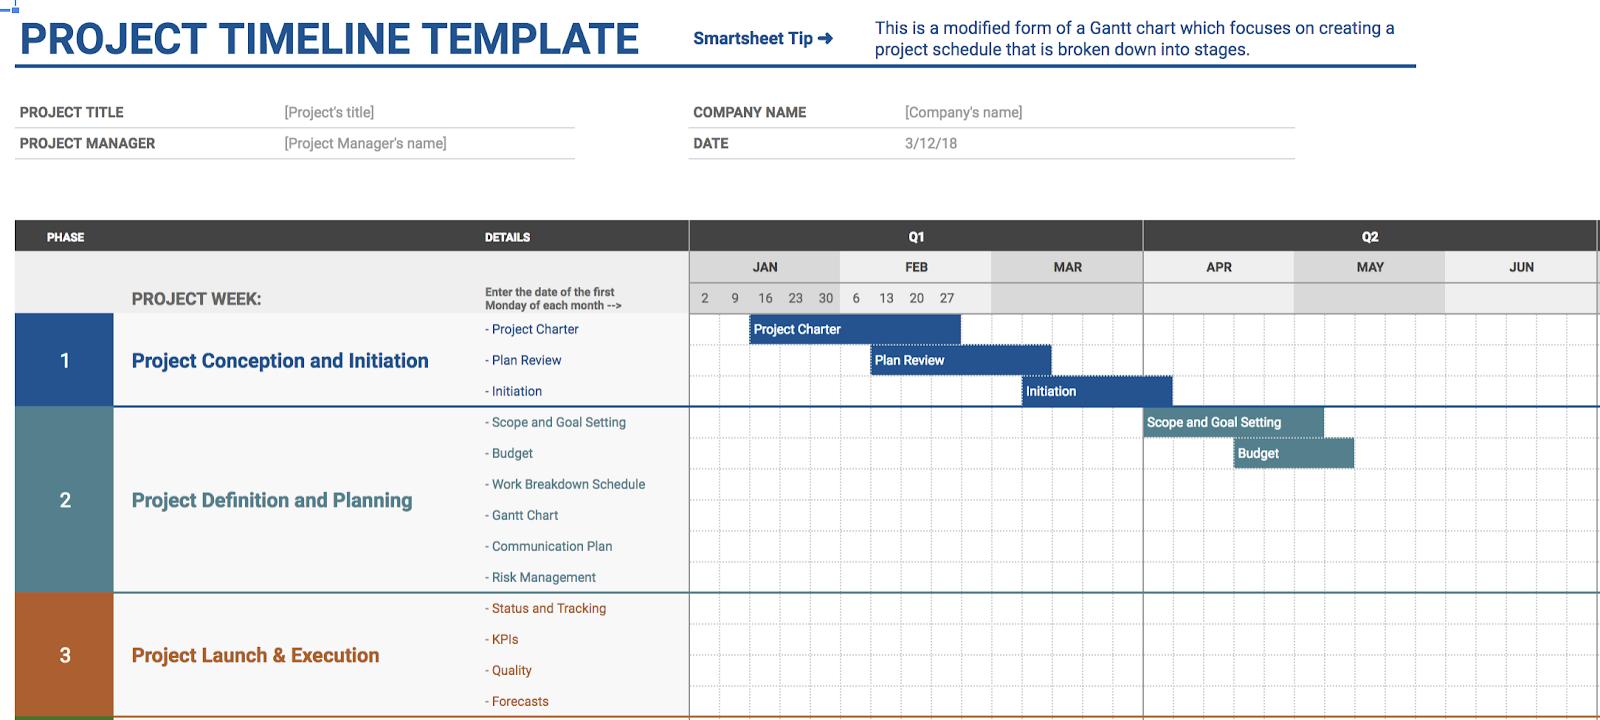 marketing calendar template google sheets  10 Google Sheets templates to help you run your startup - marketing calendar template google sheets